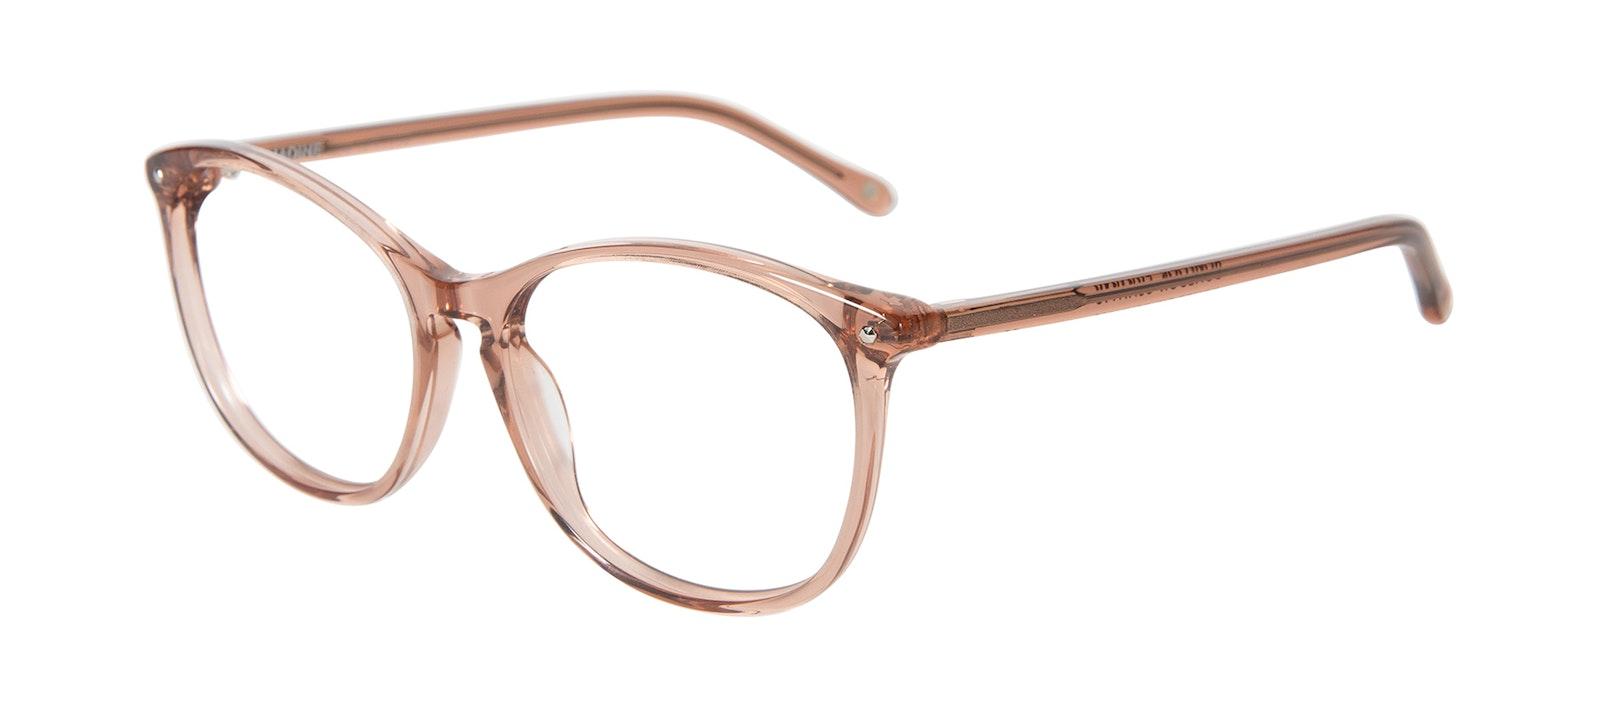 Affordable Fashion Glasses Round Eyeglasses Women Versa Rose Tilt